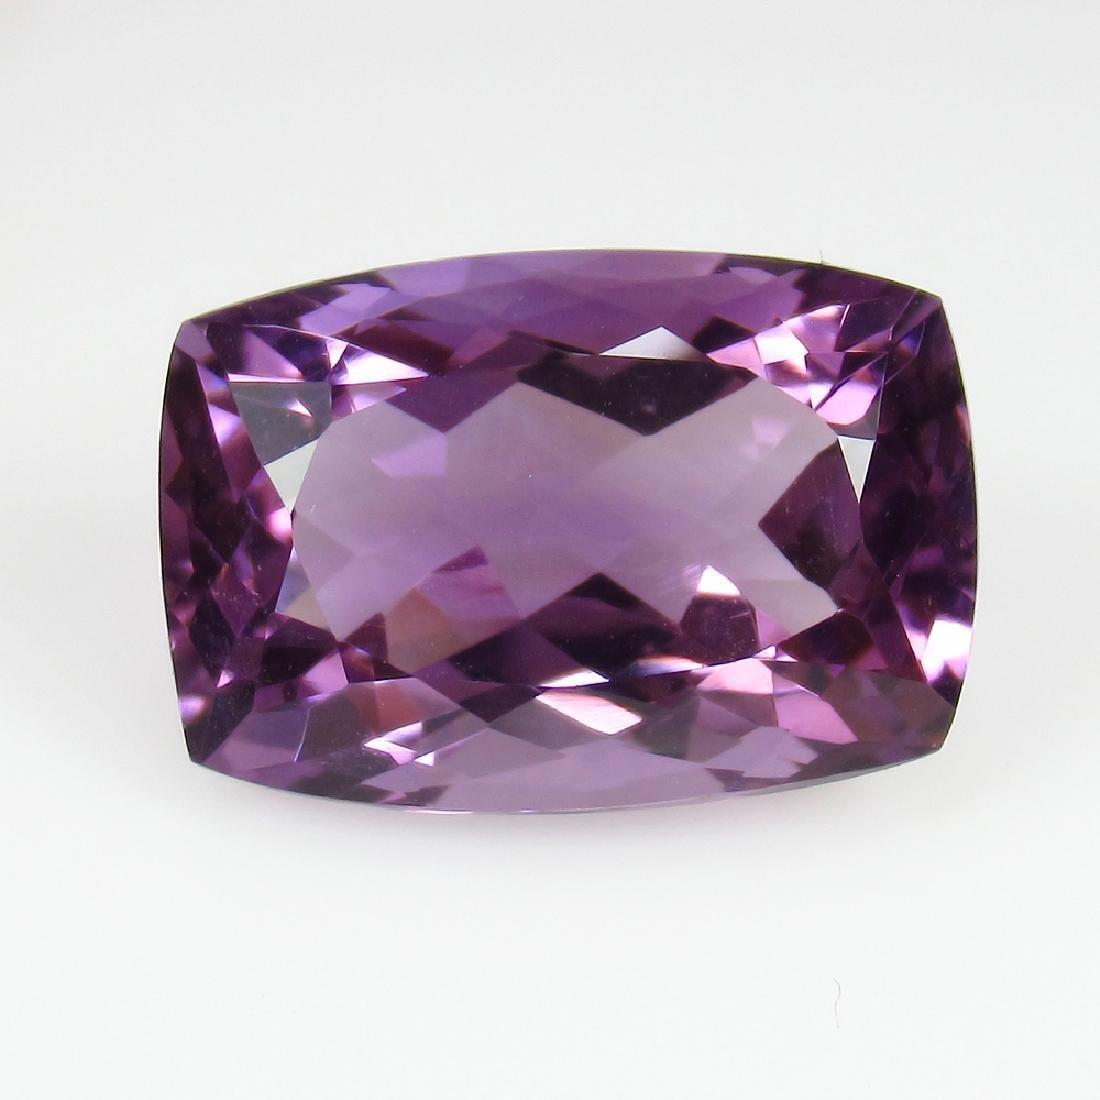 10.37 Ctw Natural Purple Amethyst Excellent Cushion Cut